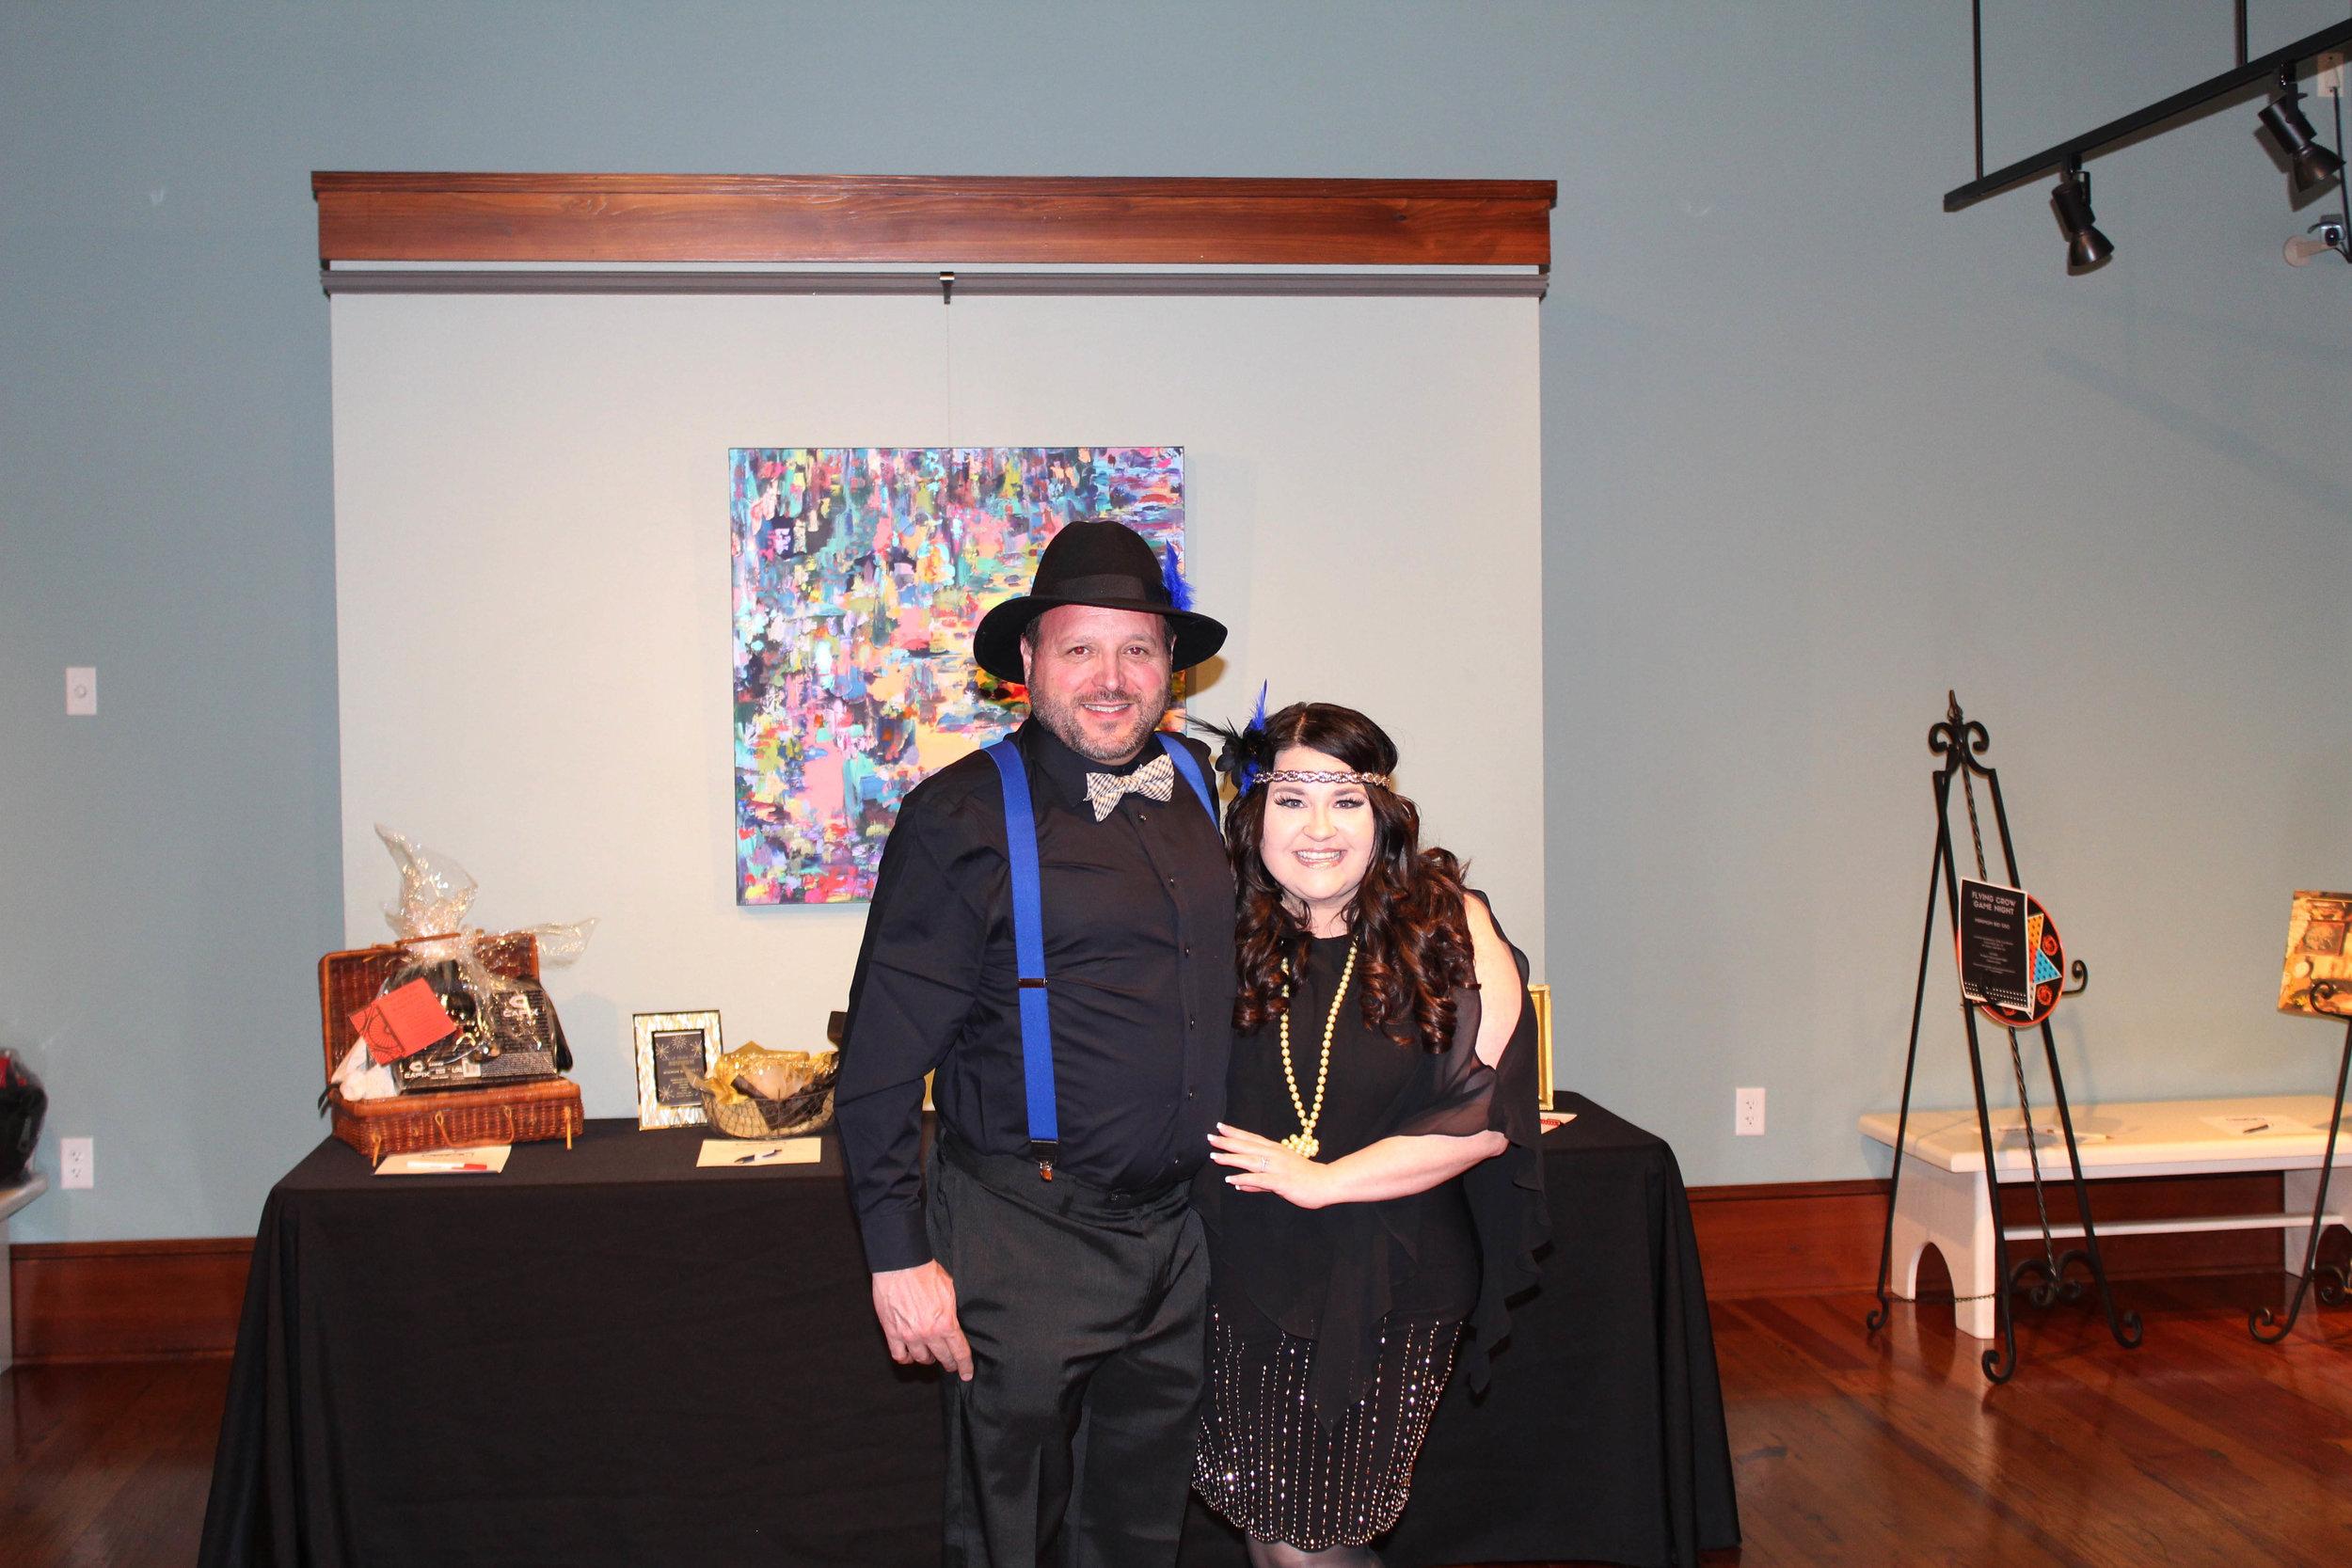 Marc Cogburn and Kelli Alamond-Cogburn